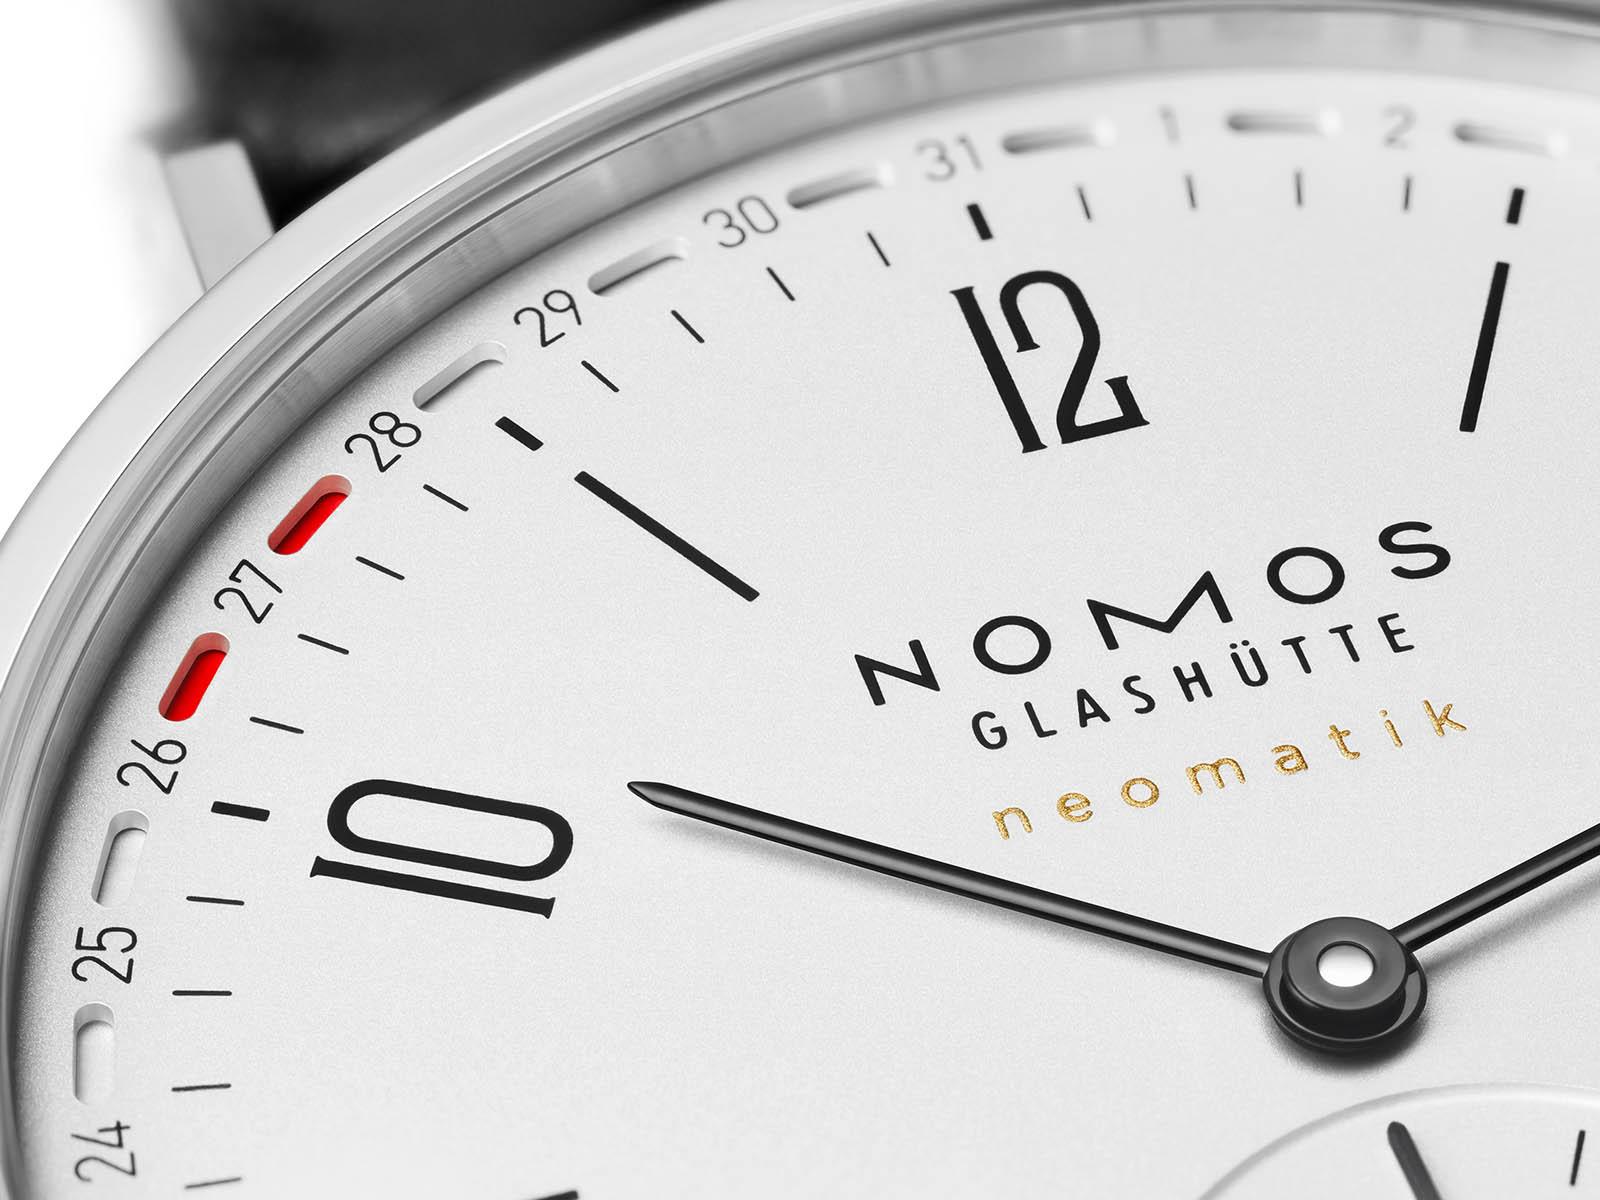 180-nomos-glashutte-tangente-neomatik-41-update-5.jpg